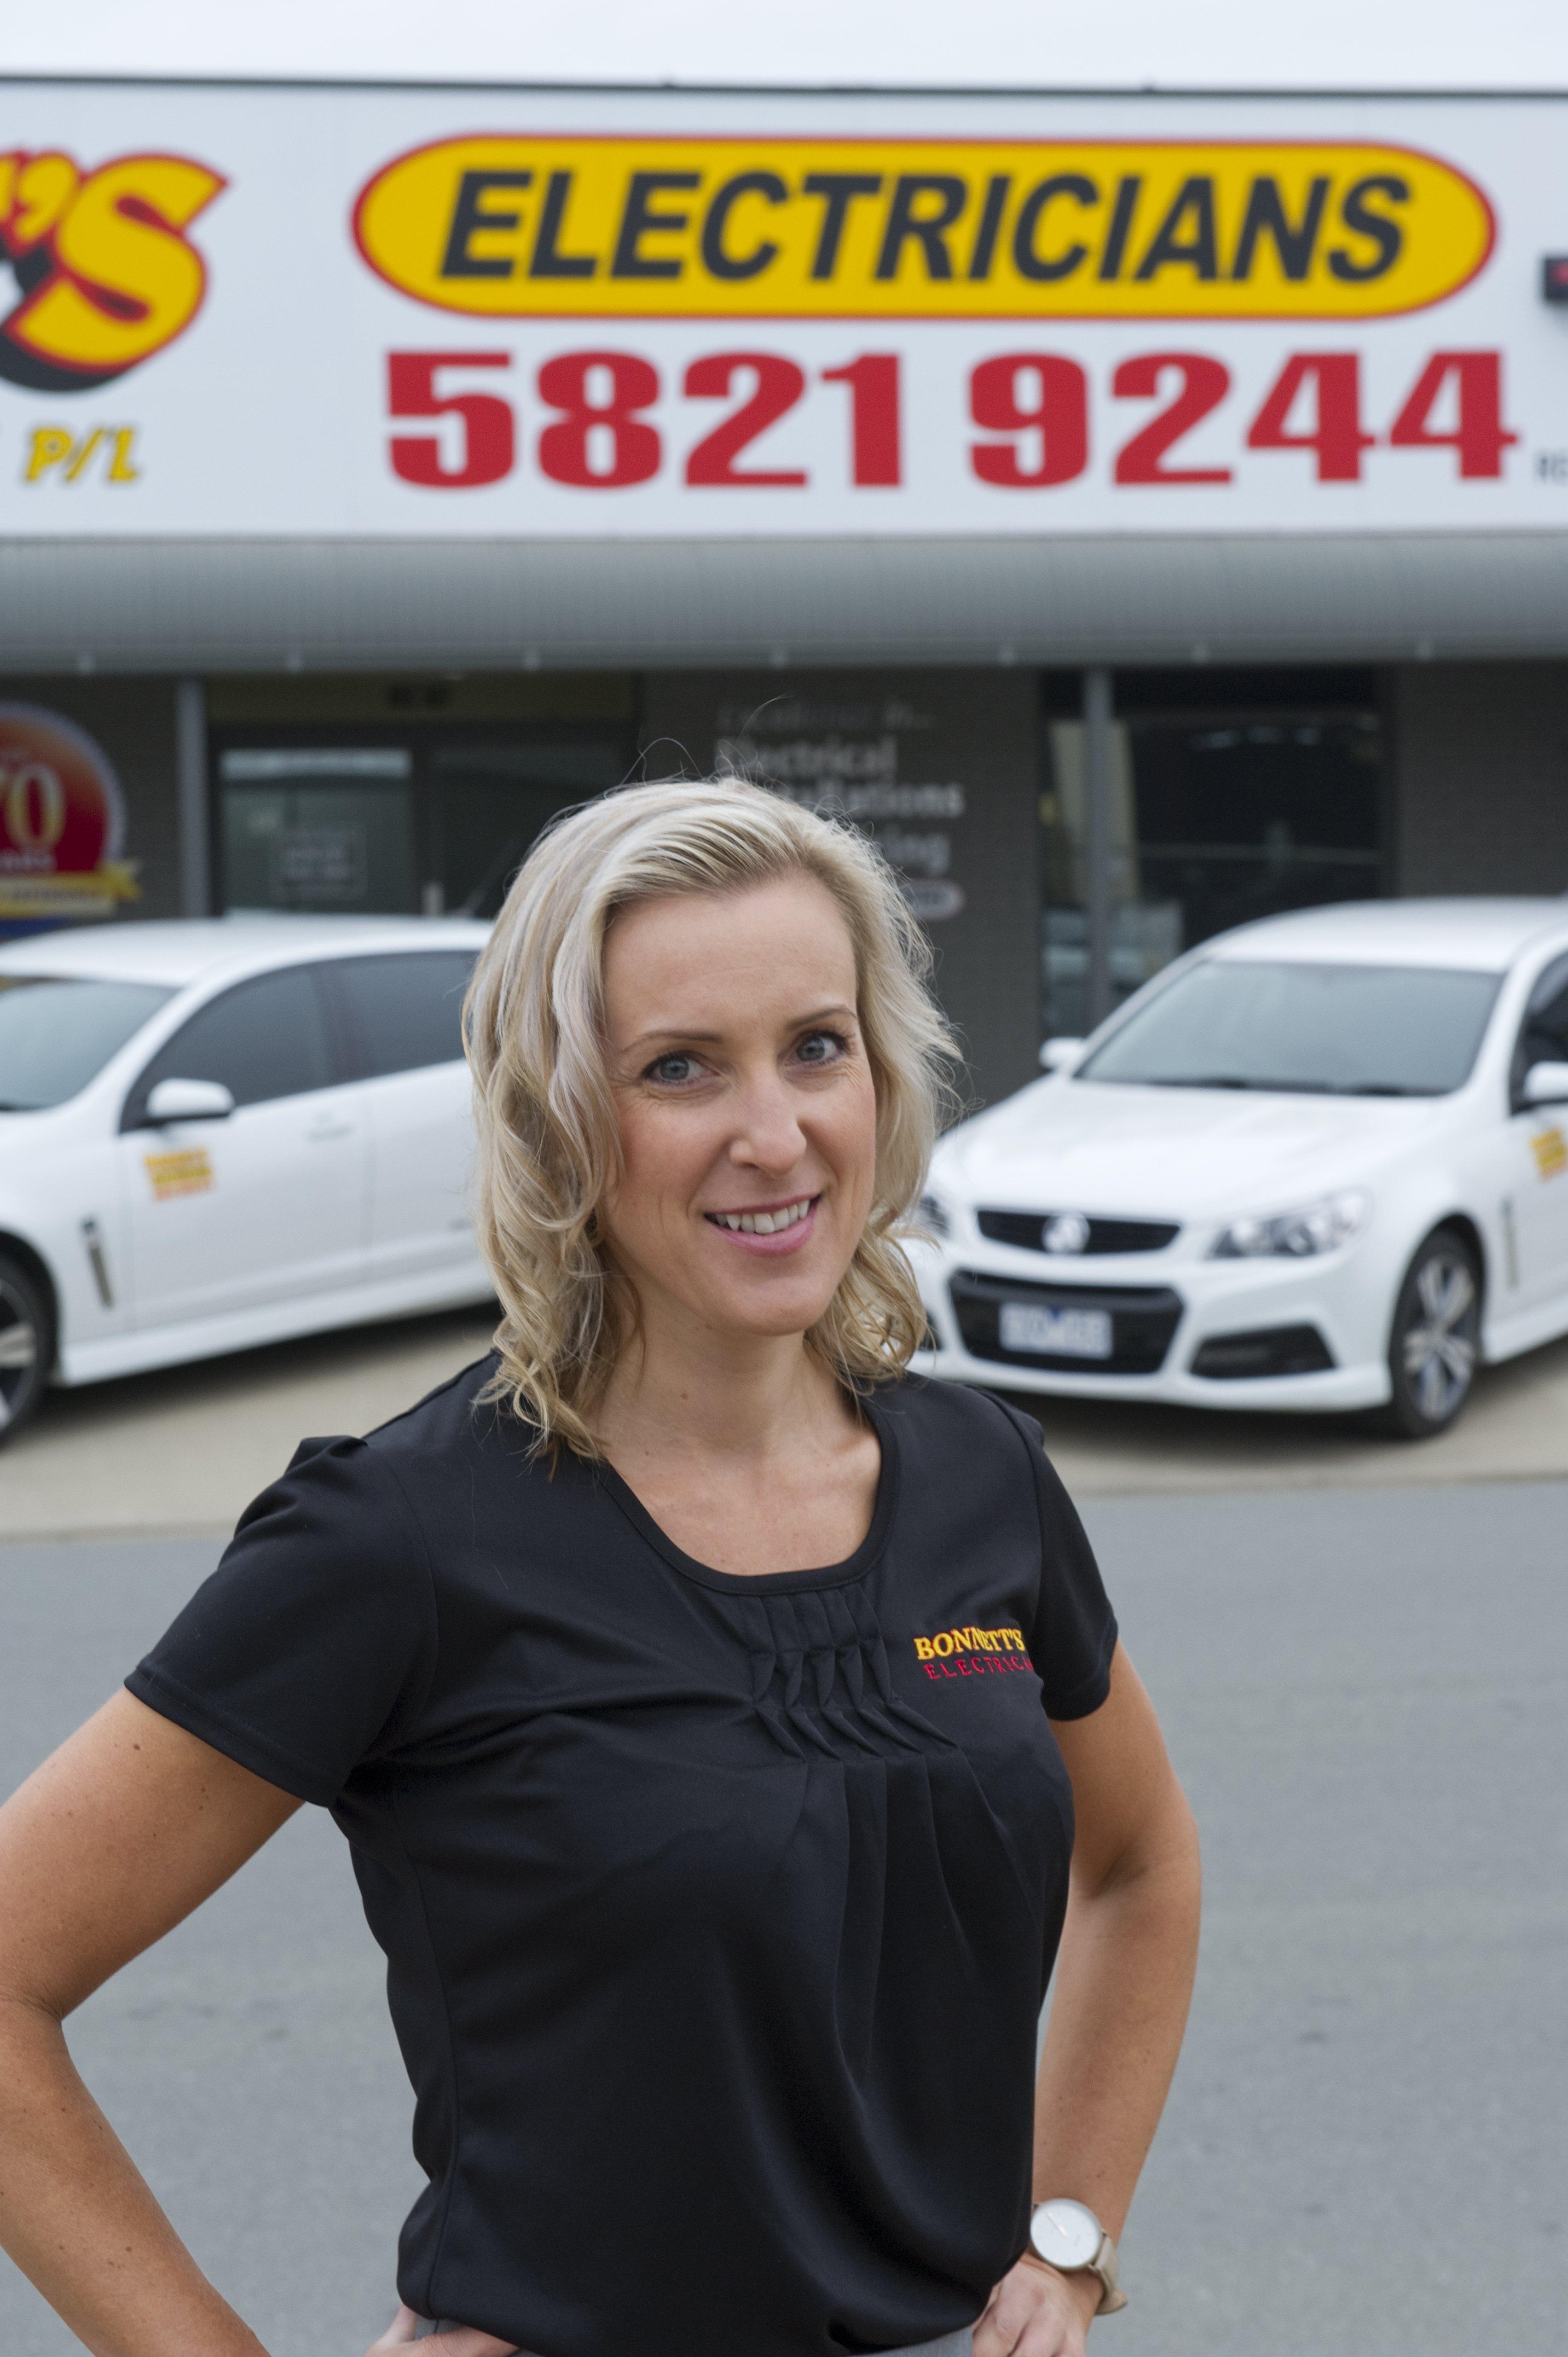 Iona Receptionist